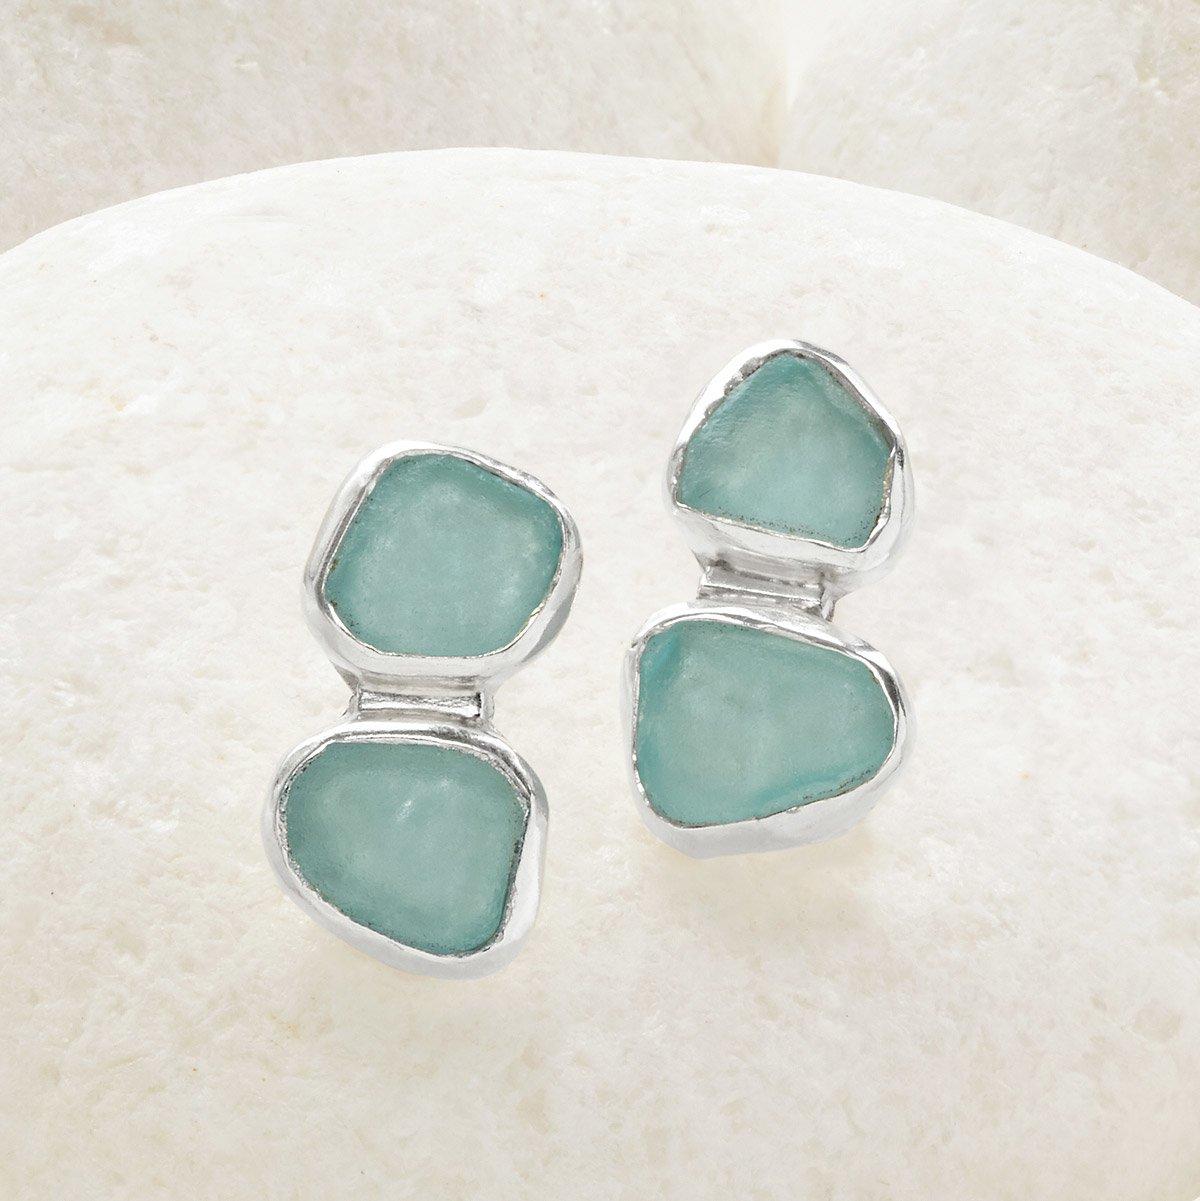 2 Stone Sea Glass Stud Earrings